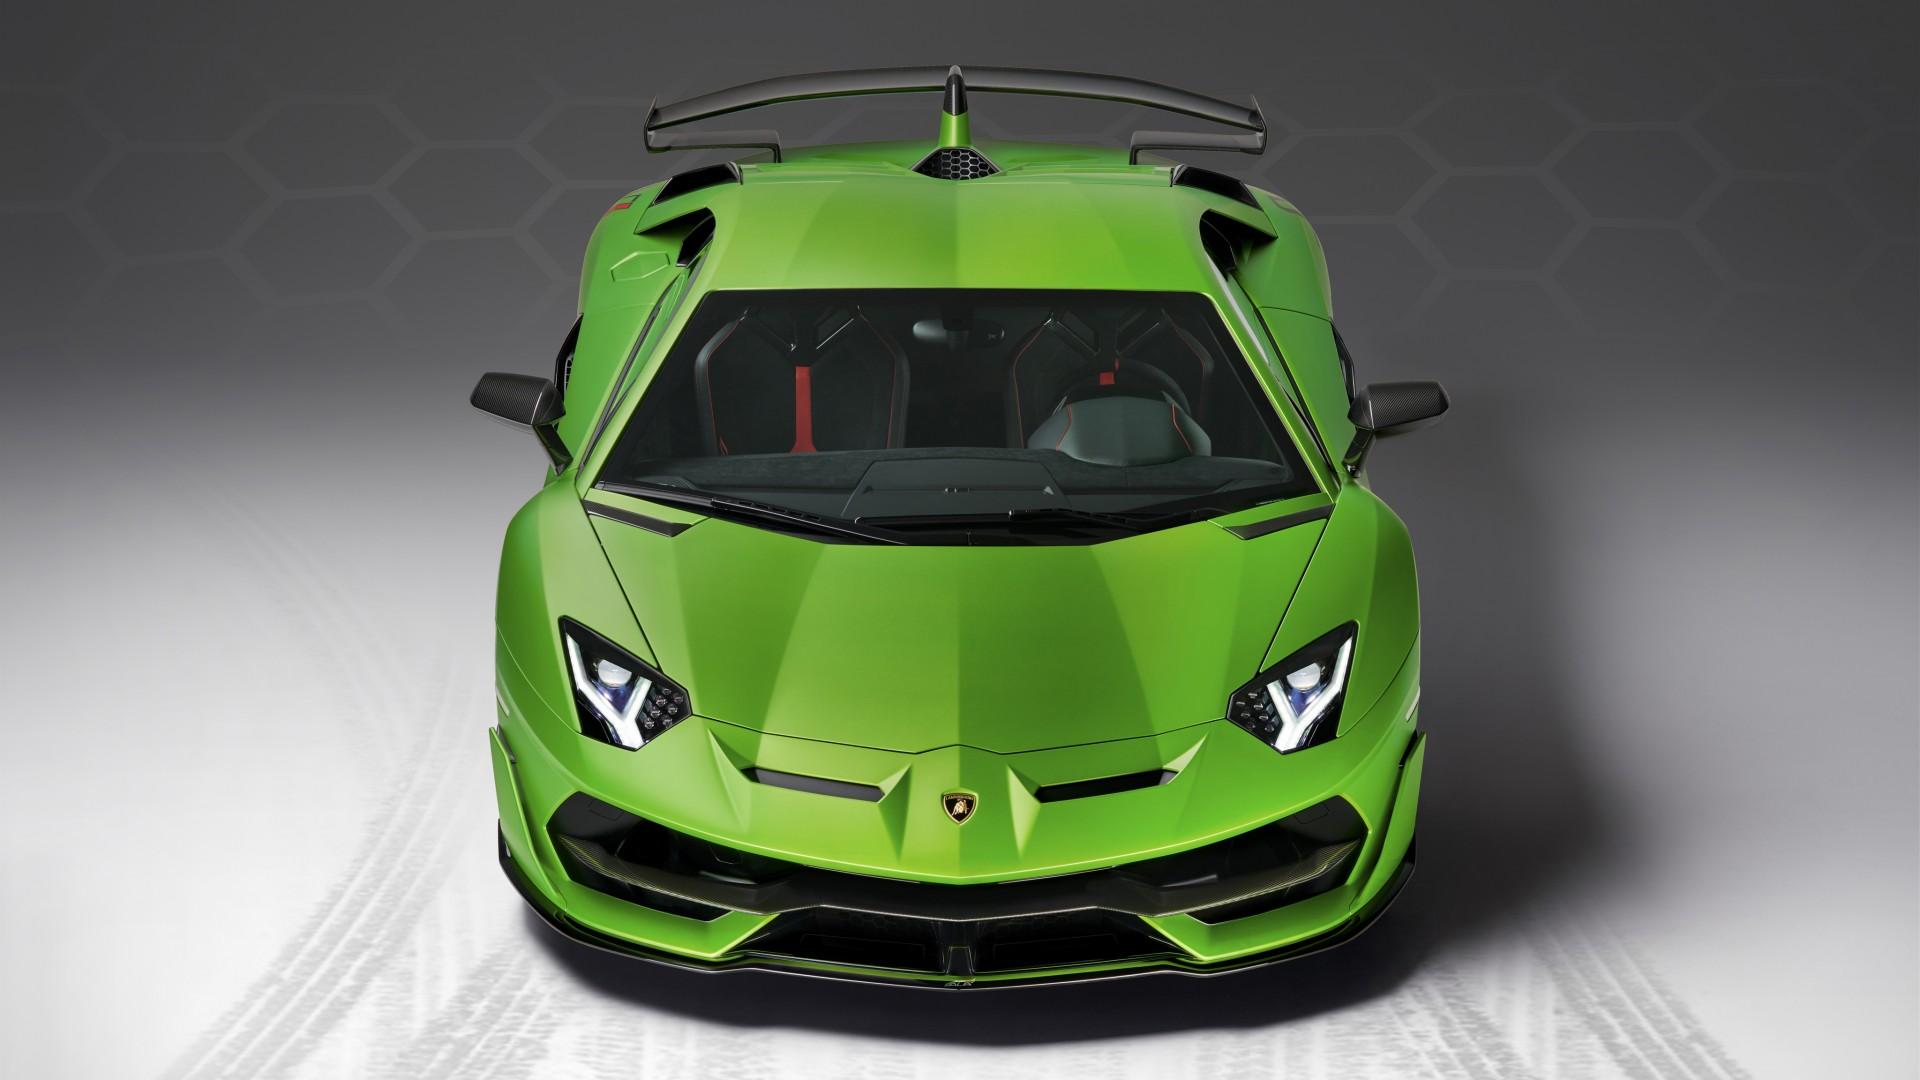 2019 Lamborghini Aventador Svj 4k Wallpaper Hd Car